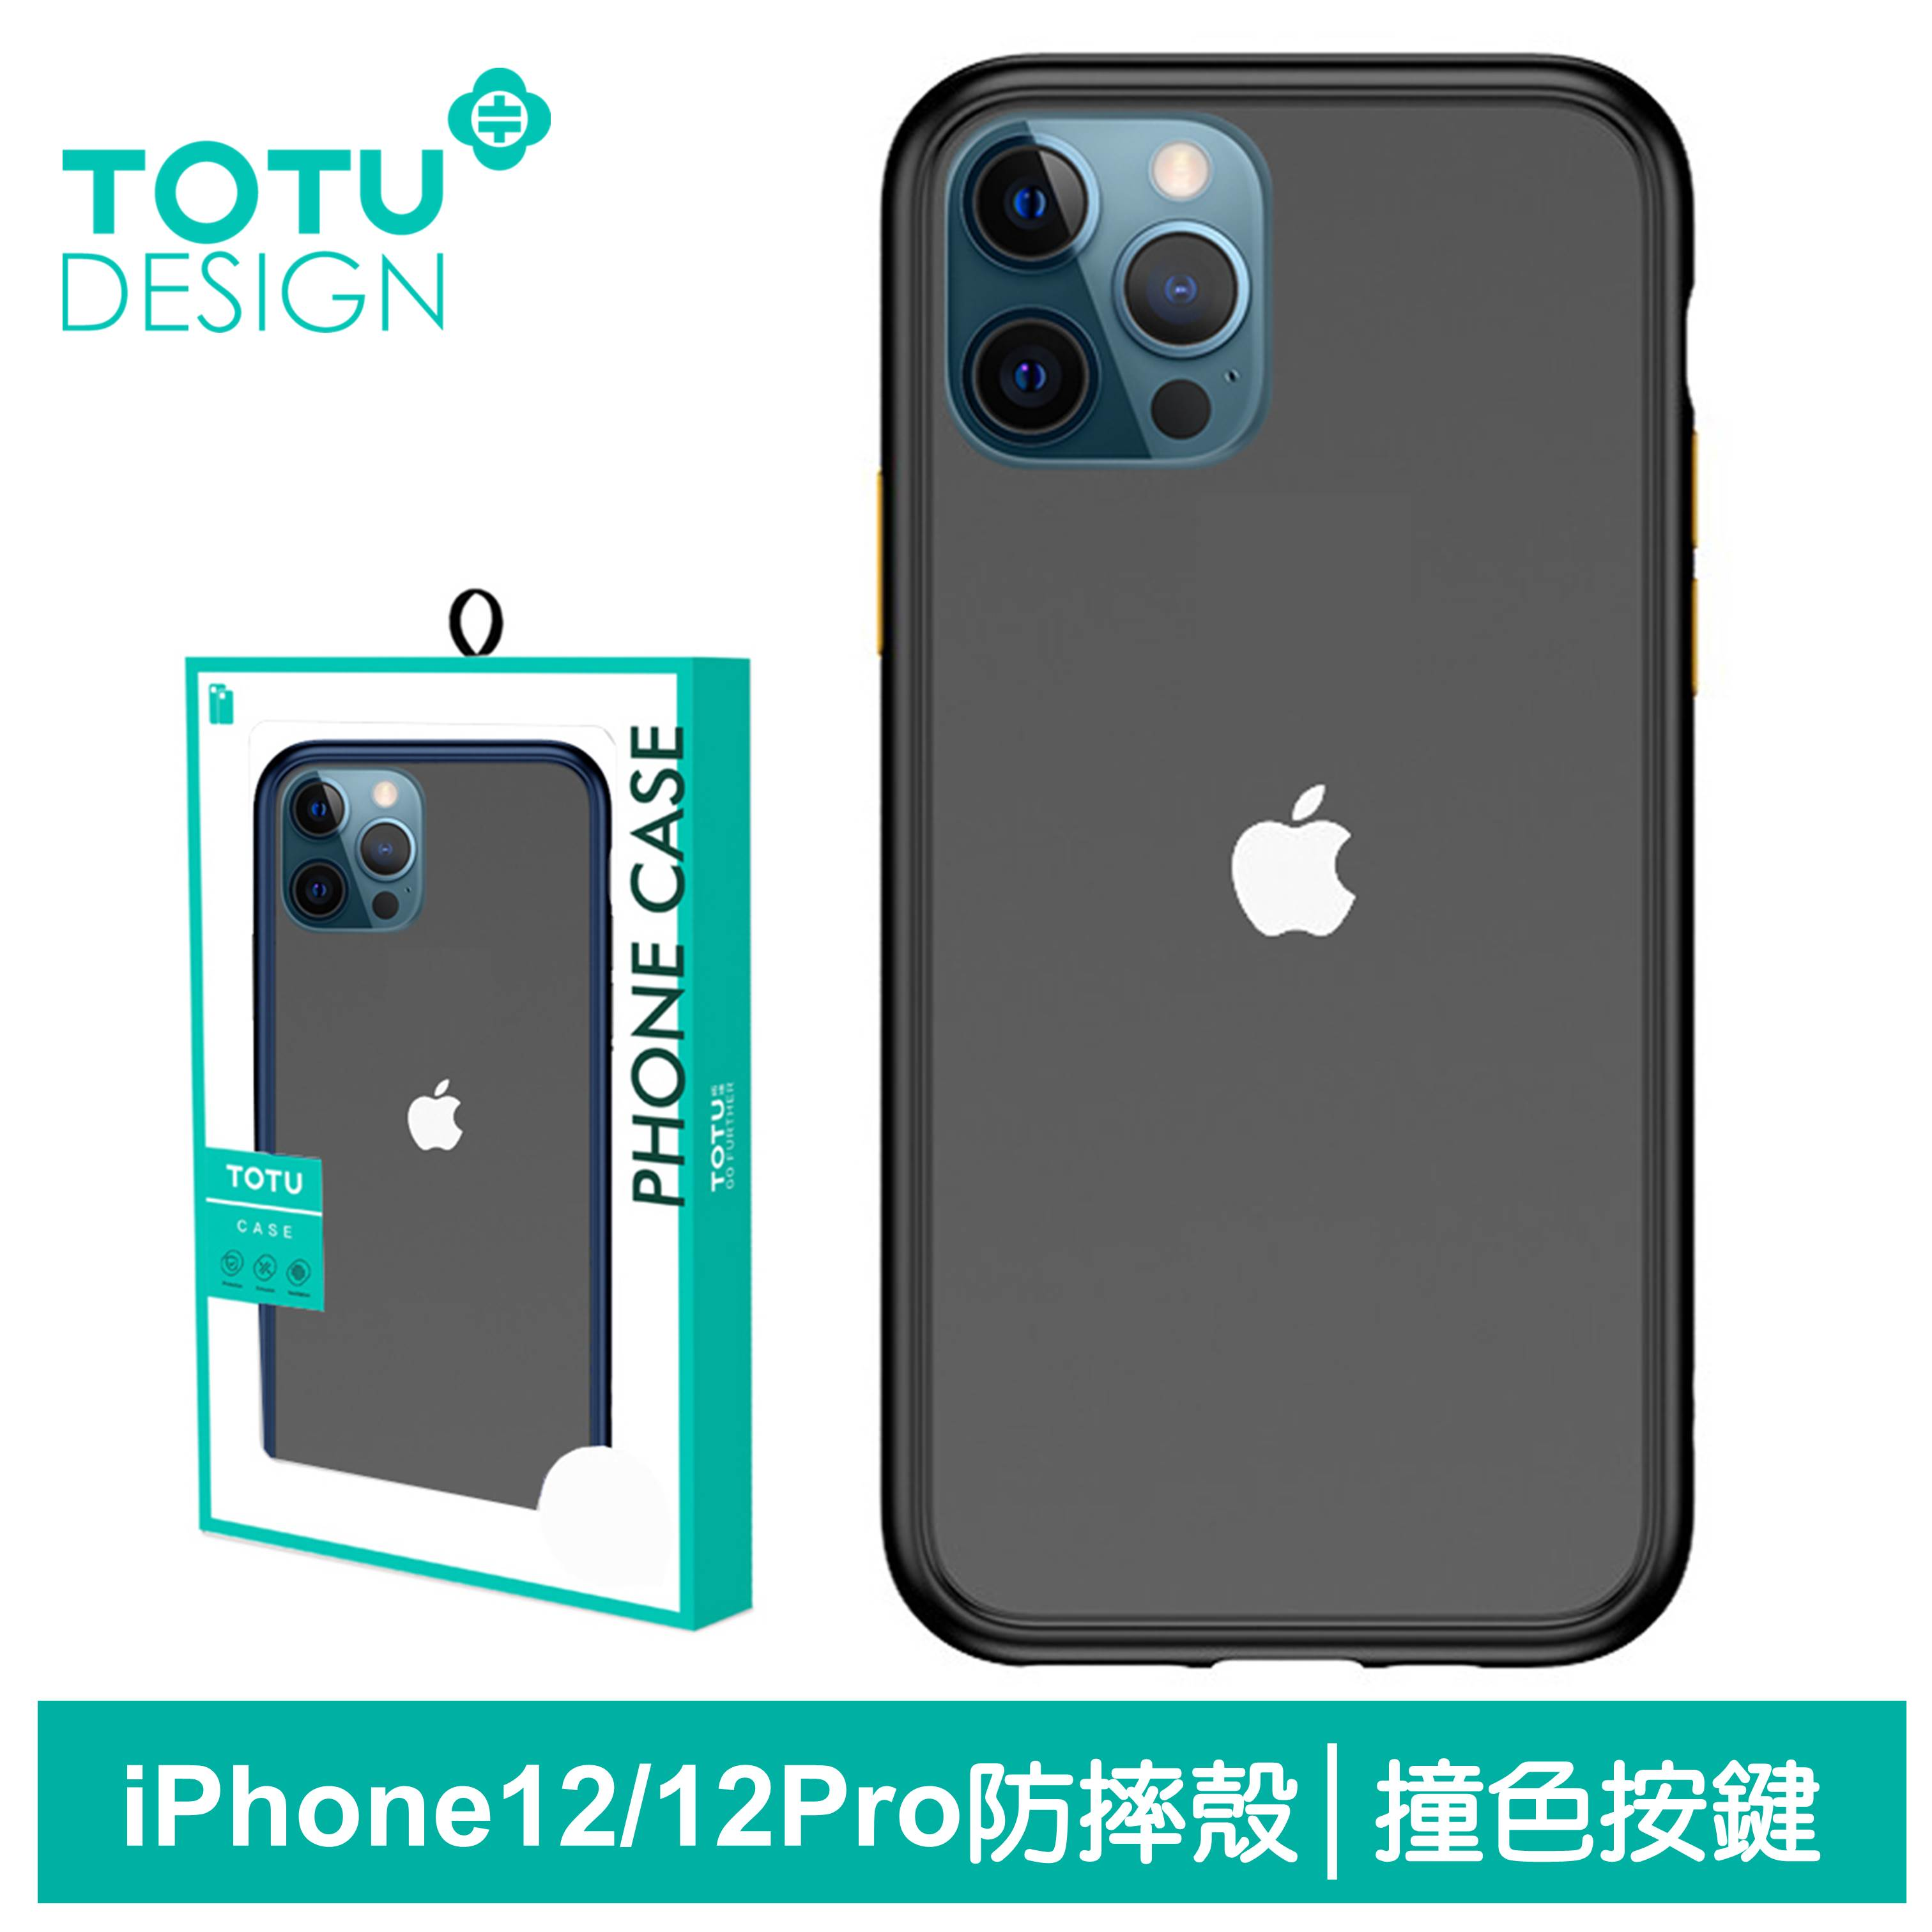 TOTU台灣官方 iPhone 12 / 12 Pro 手機殼 i12 Pro 保護殼 6.1吋 防摔殼 撞色按鍵 晶剛系列 黑色